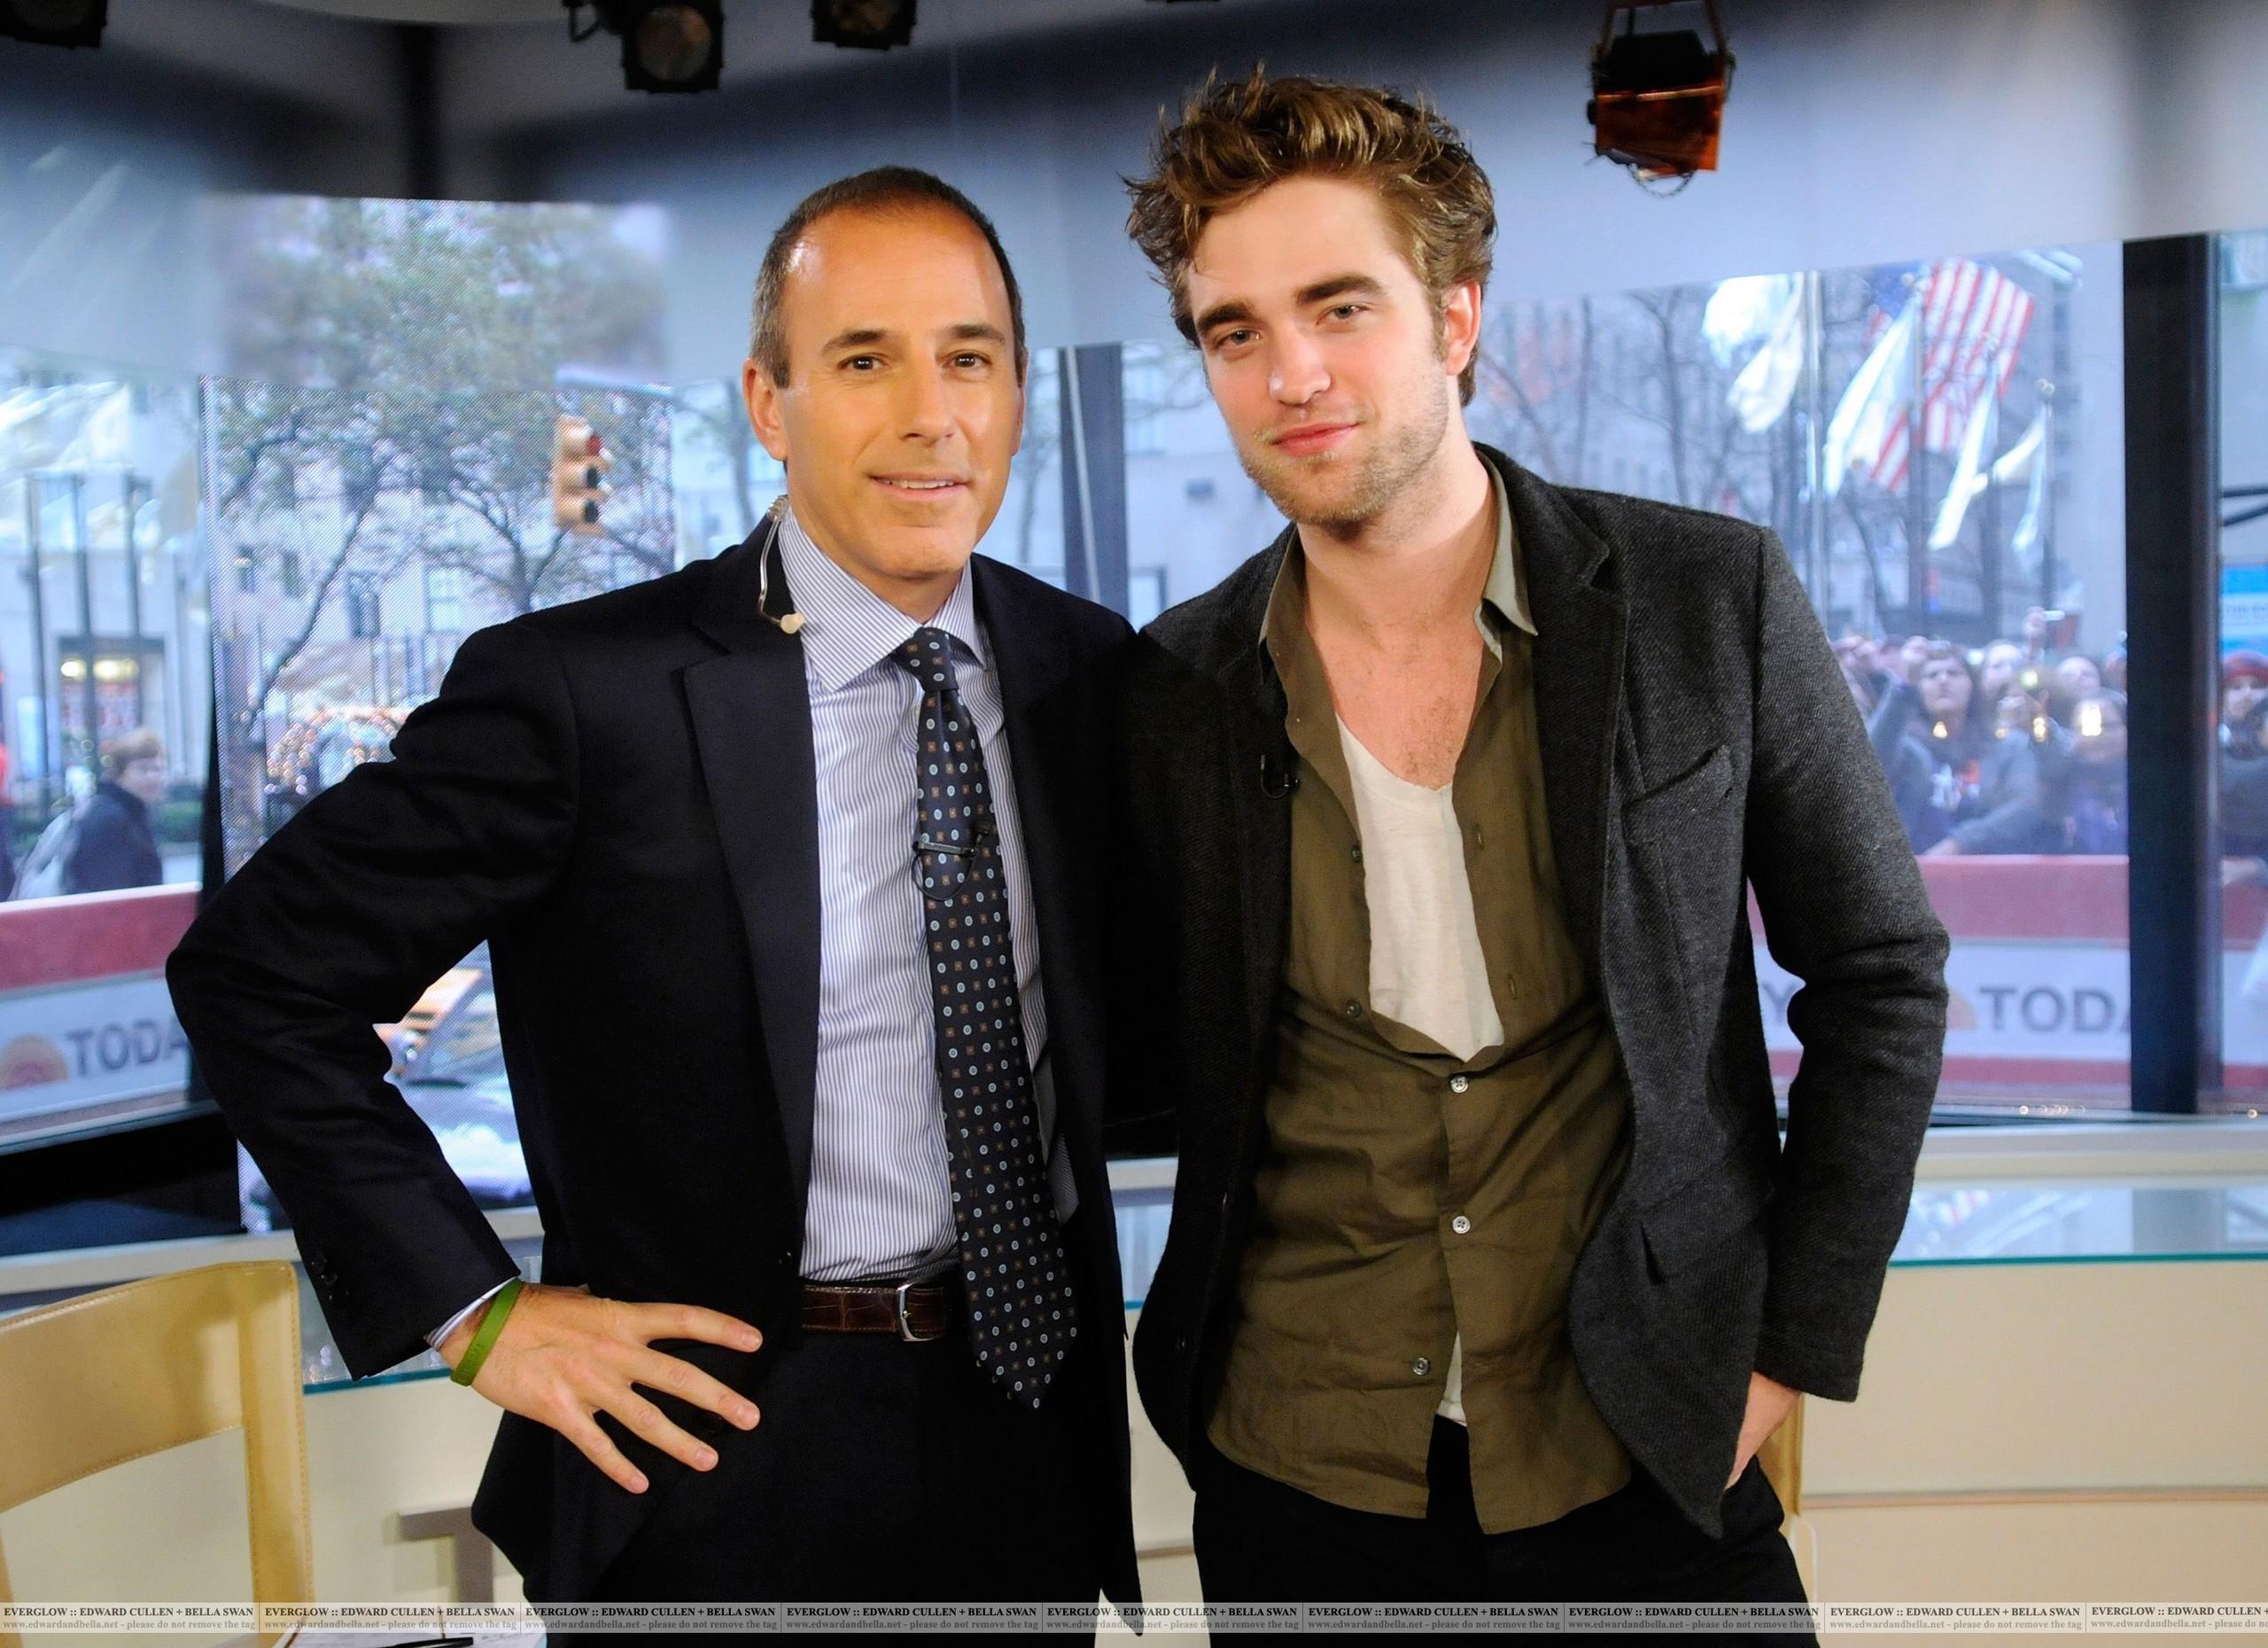 Robert Pattinson TODAY दिखाना